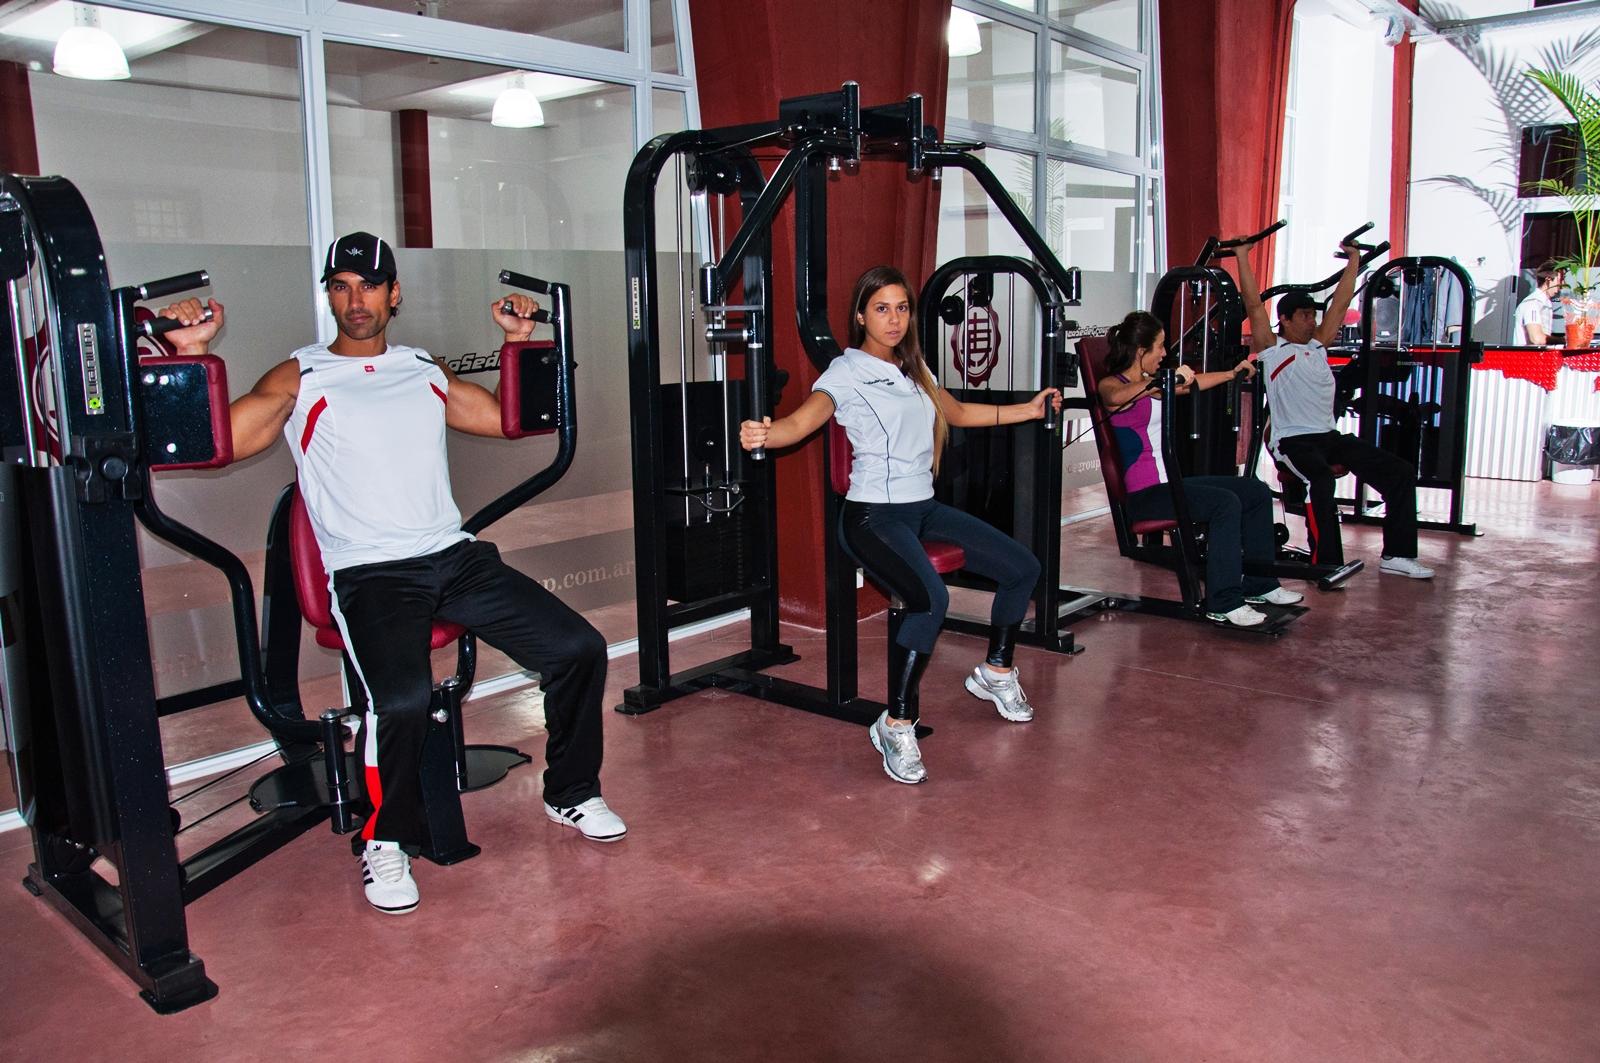 El periodist digit l lan s amplia moderno gimnasio for Gimnasio moderno